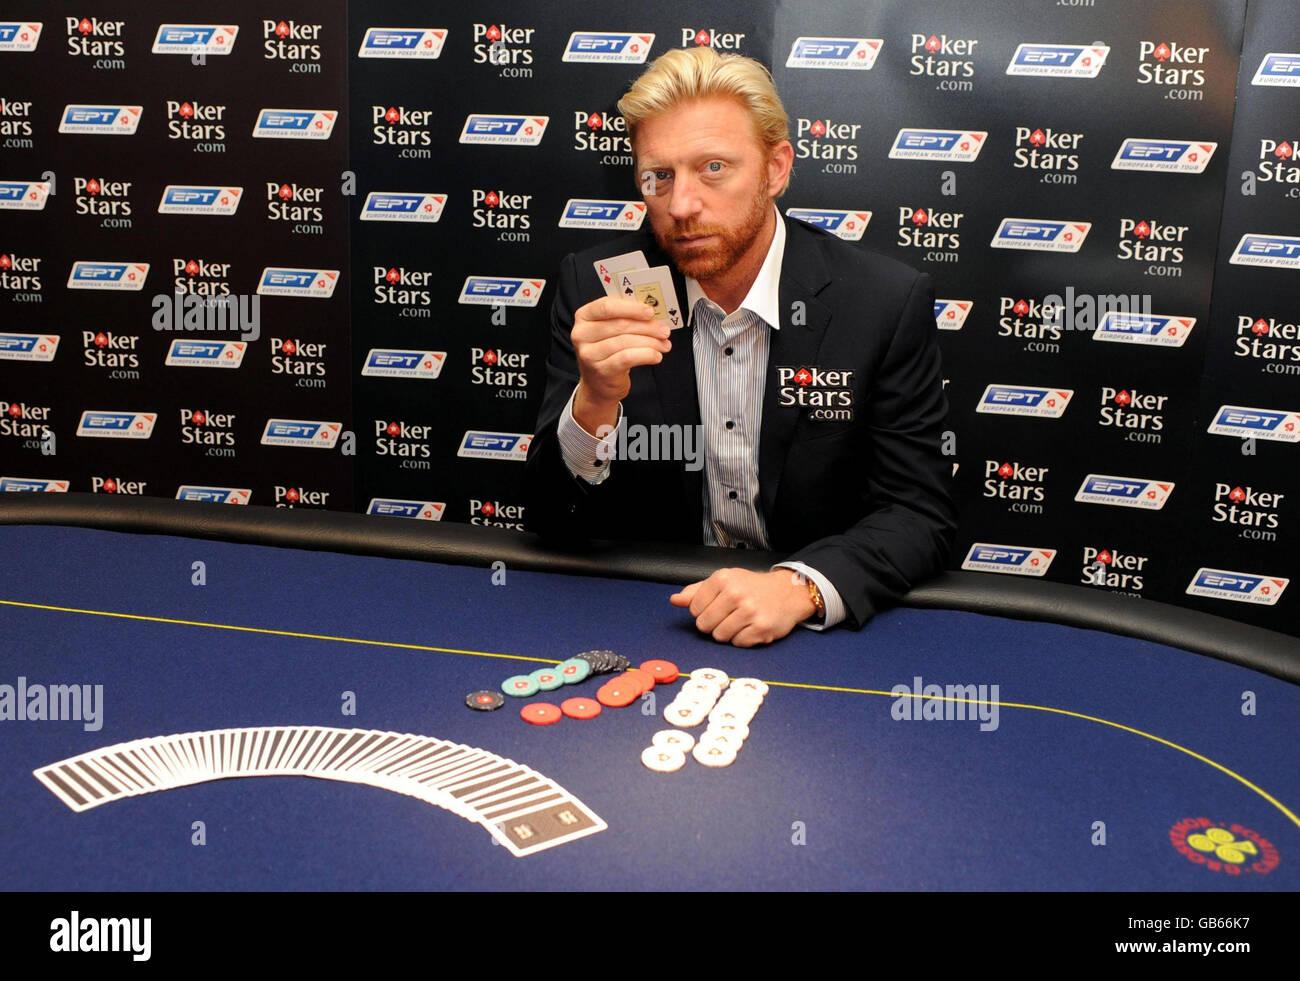 Boris Becker Launches The Pokerstars Com European Poker Tour London Stock Photo Alamy